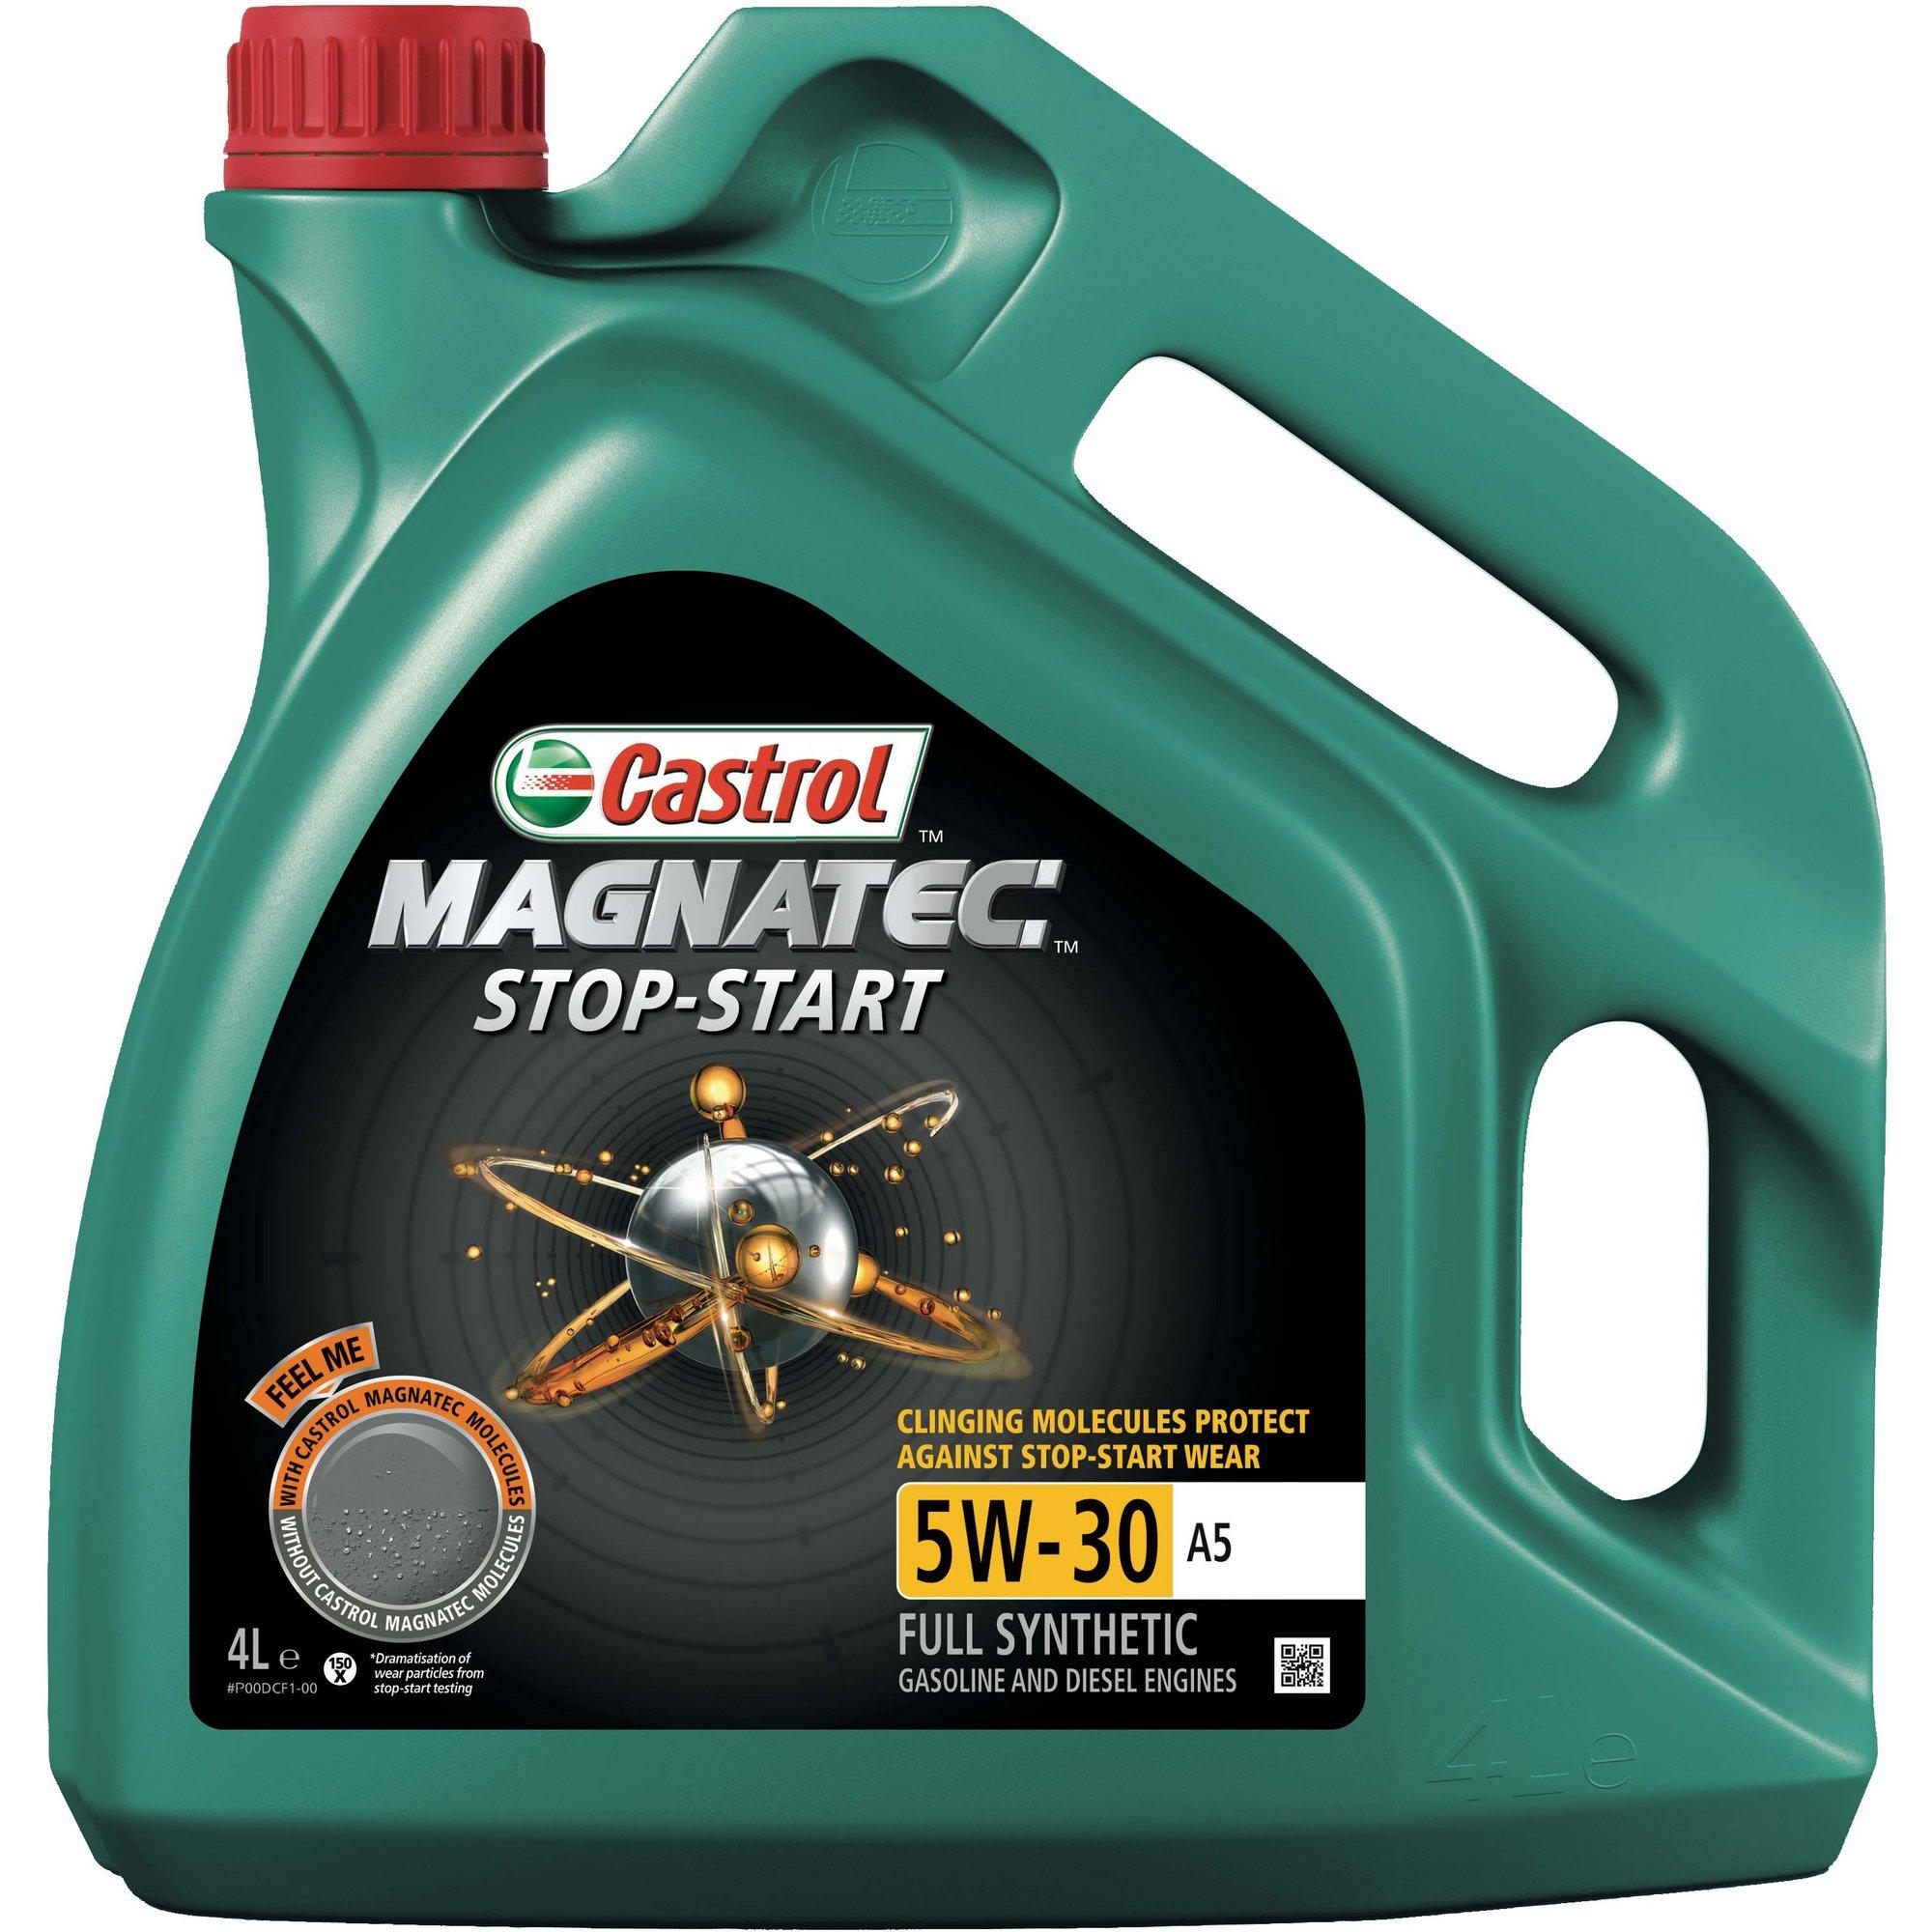 castrol magnatec 5w 30 a1 fully synthetic oil 4 liter ebay. Black Bedroom Furniture Sets. Home Design Ideas